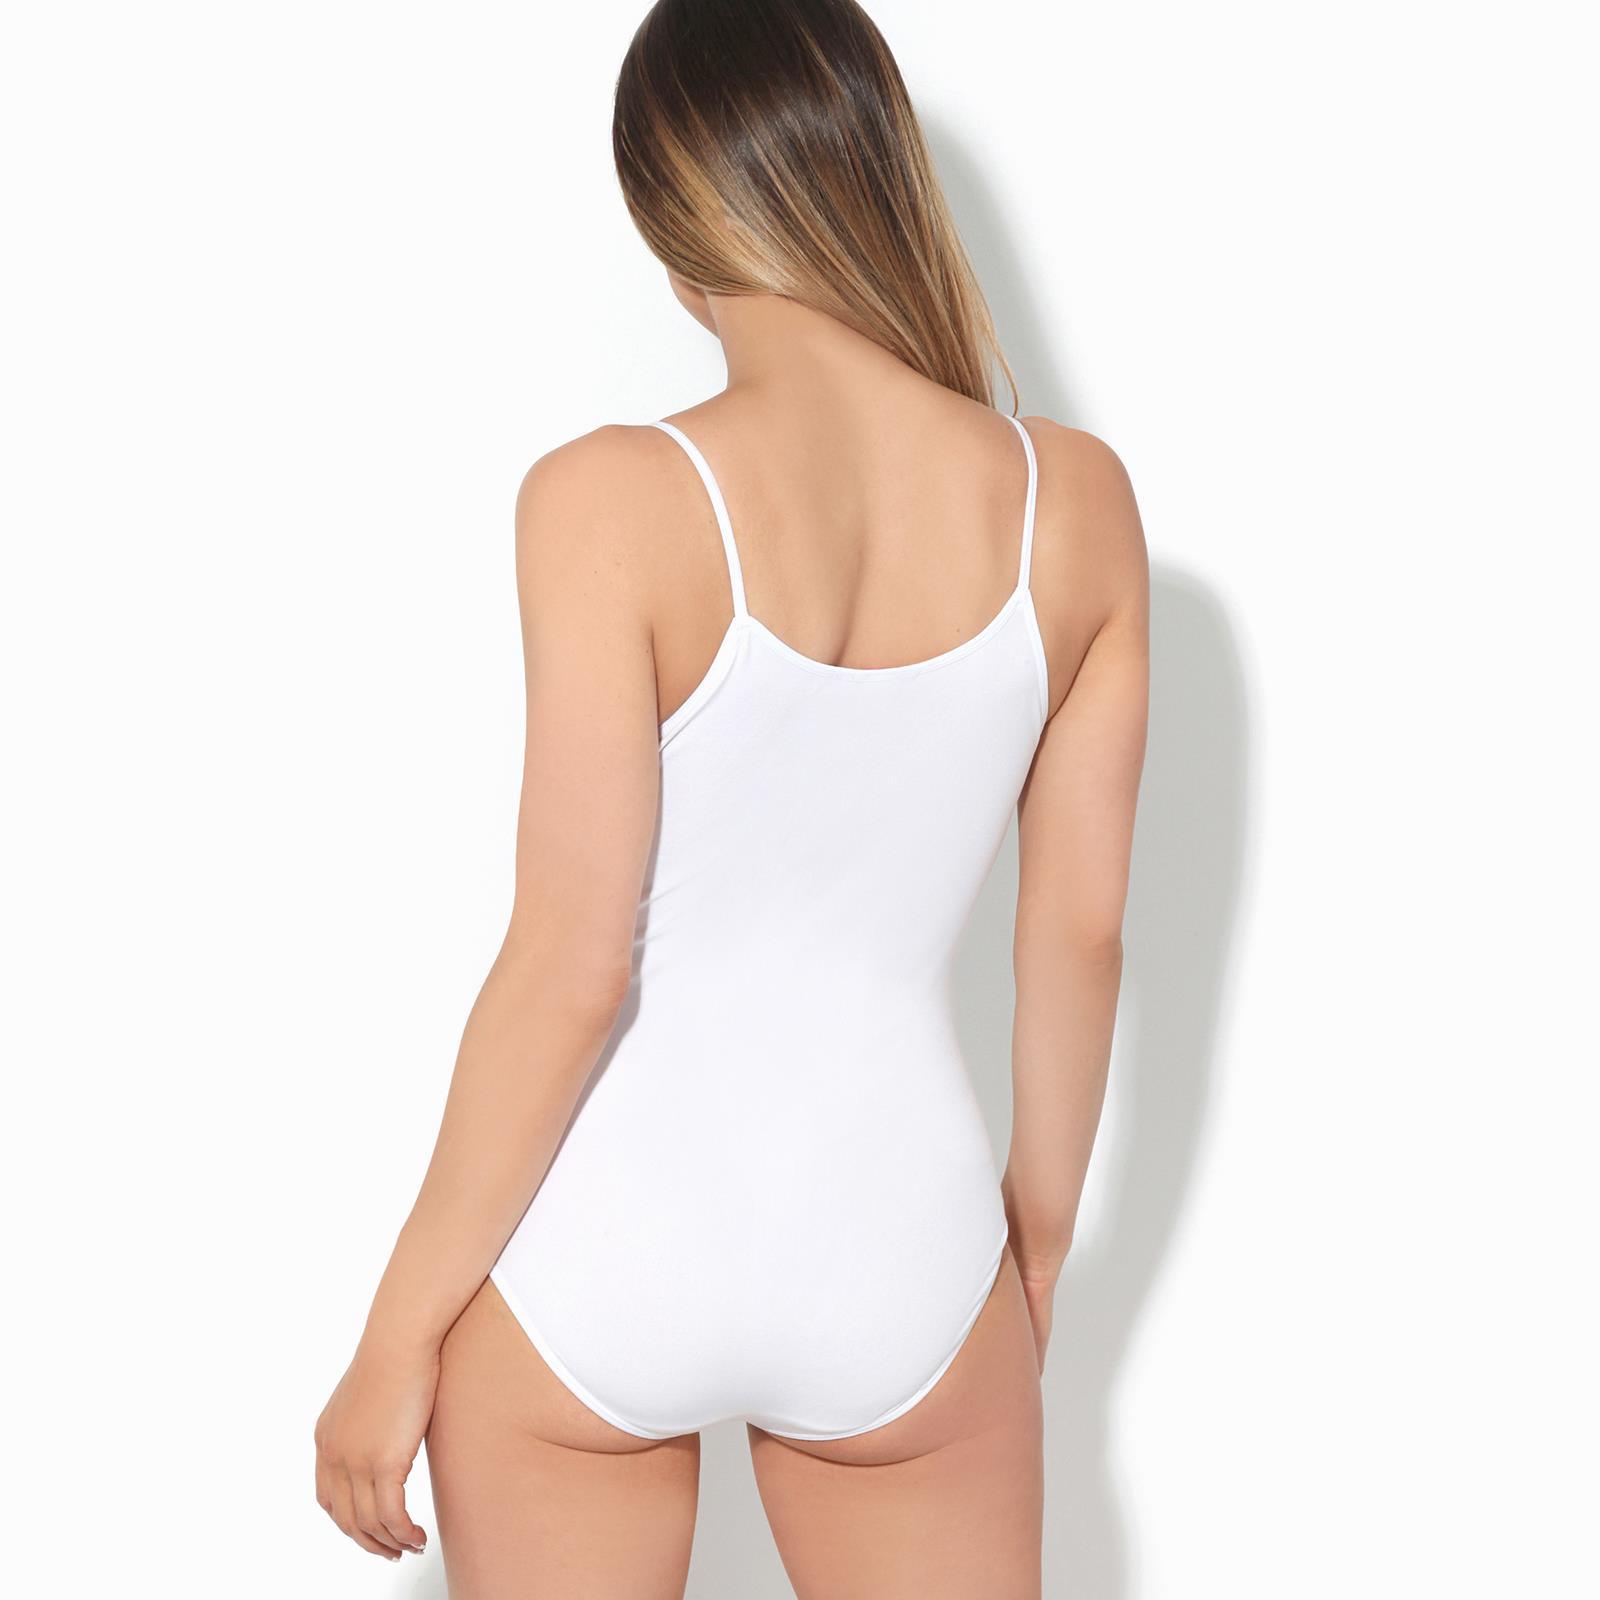 Body-Mujer-Basico-Invierno-Cuello-Barato-Top-Camiseta-Ajustado-Tirantes-Elastico miniatura 17